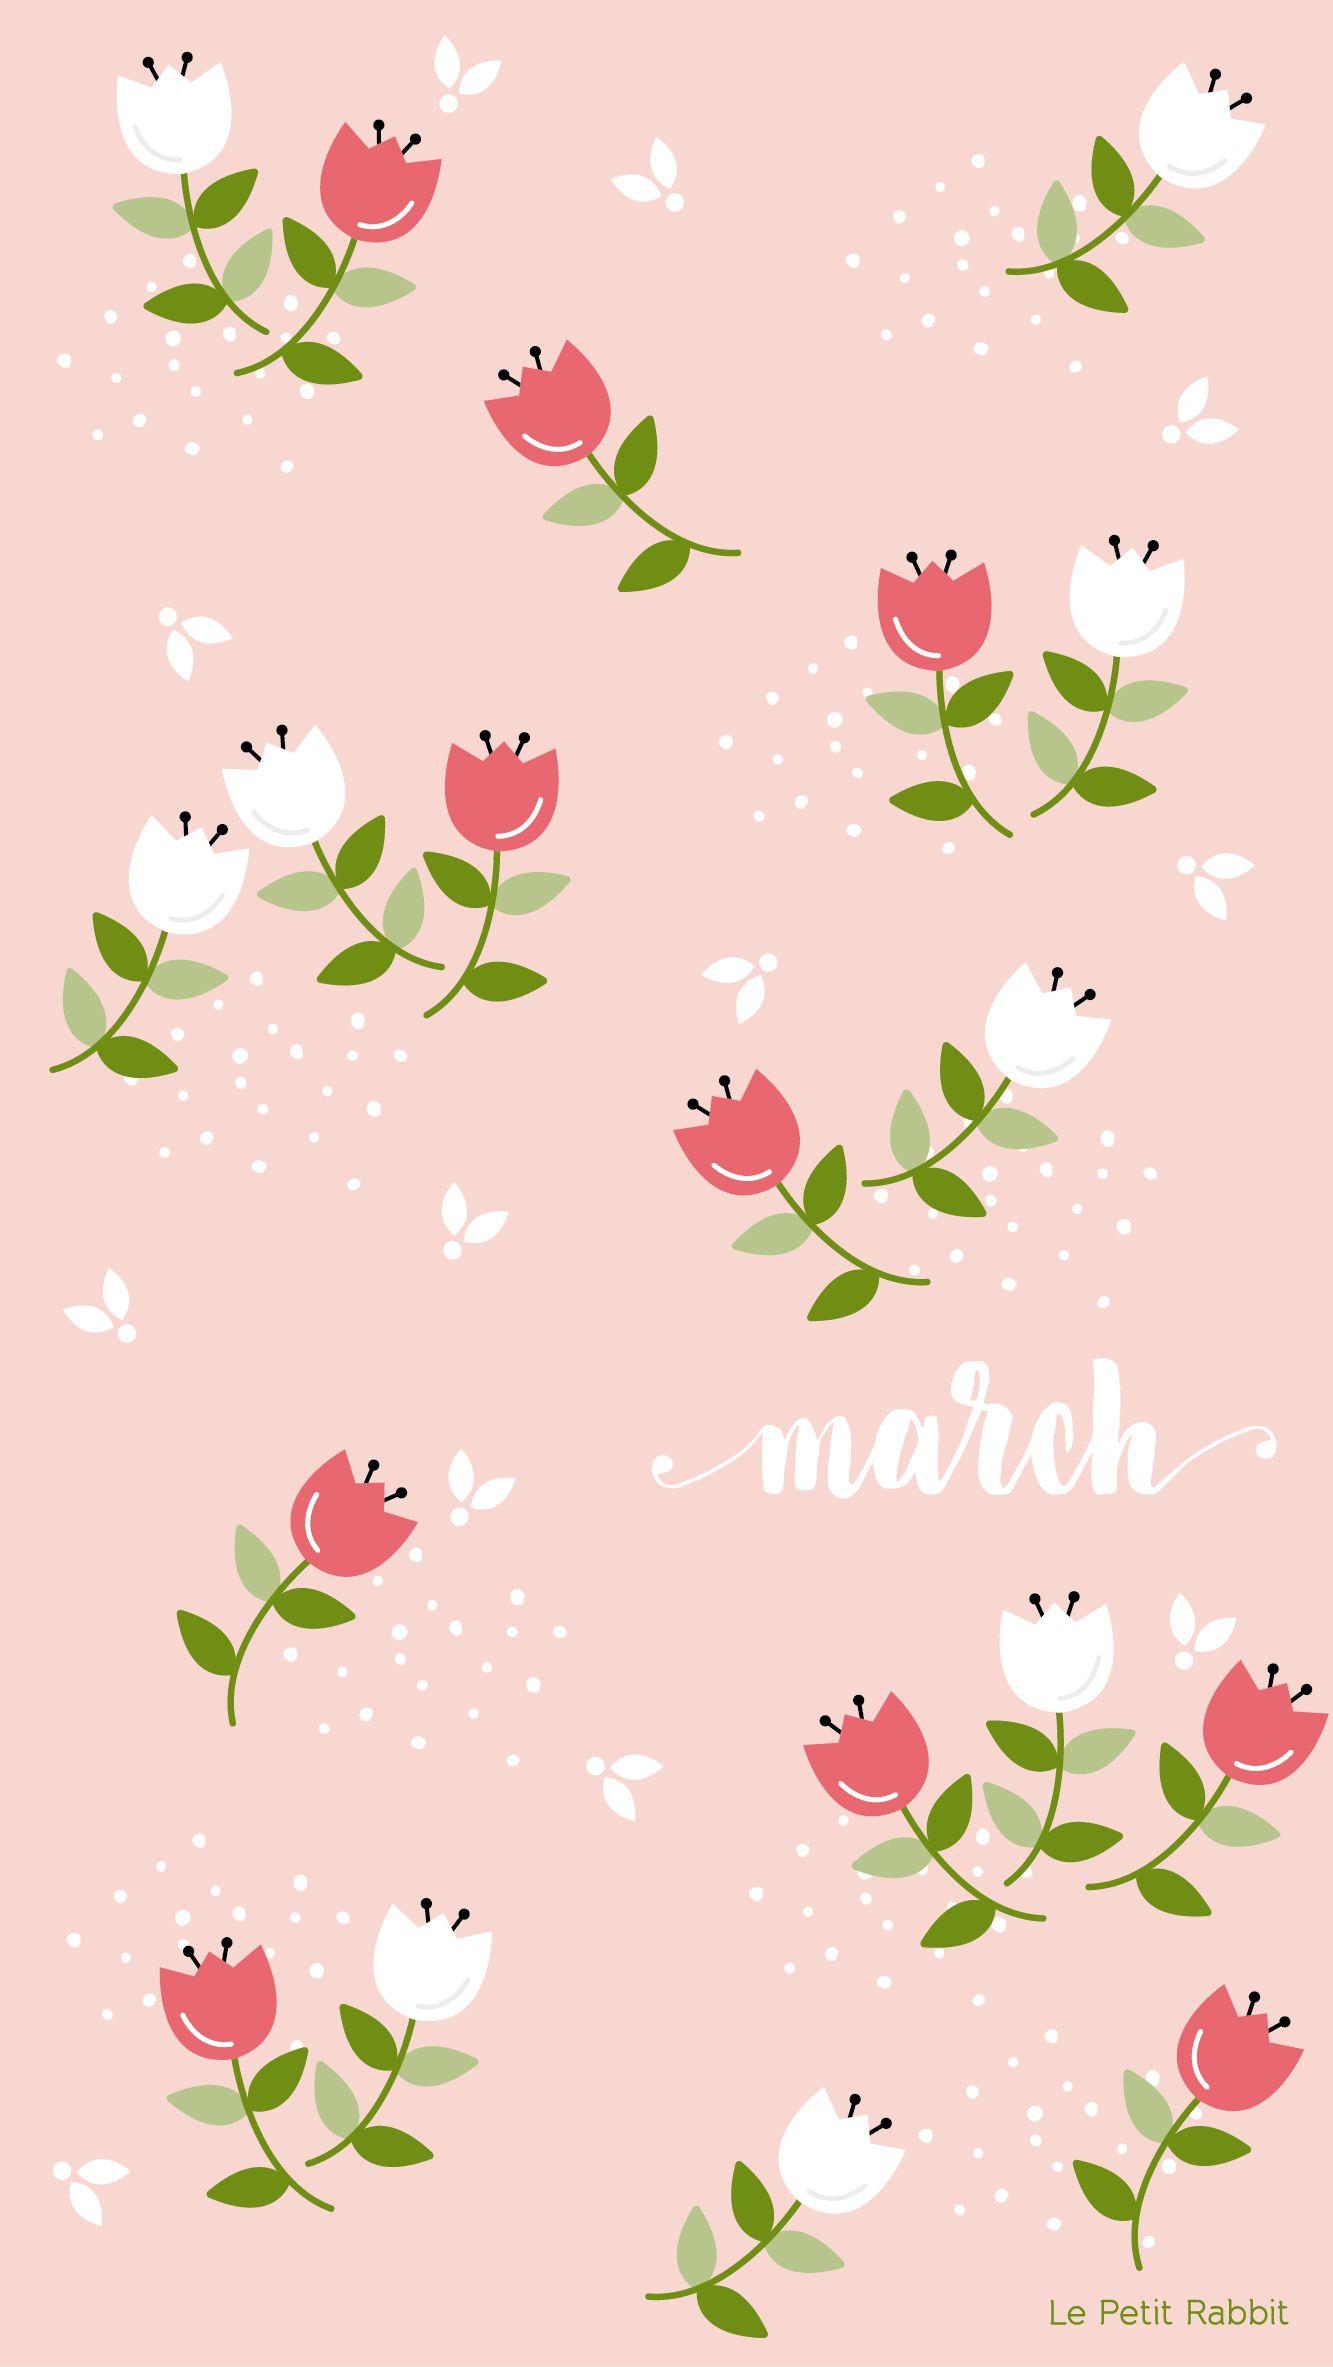 Free Iphone Wallpaper By Le Petit Rabbit Cute Wallpaper